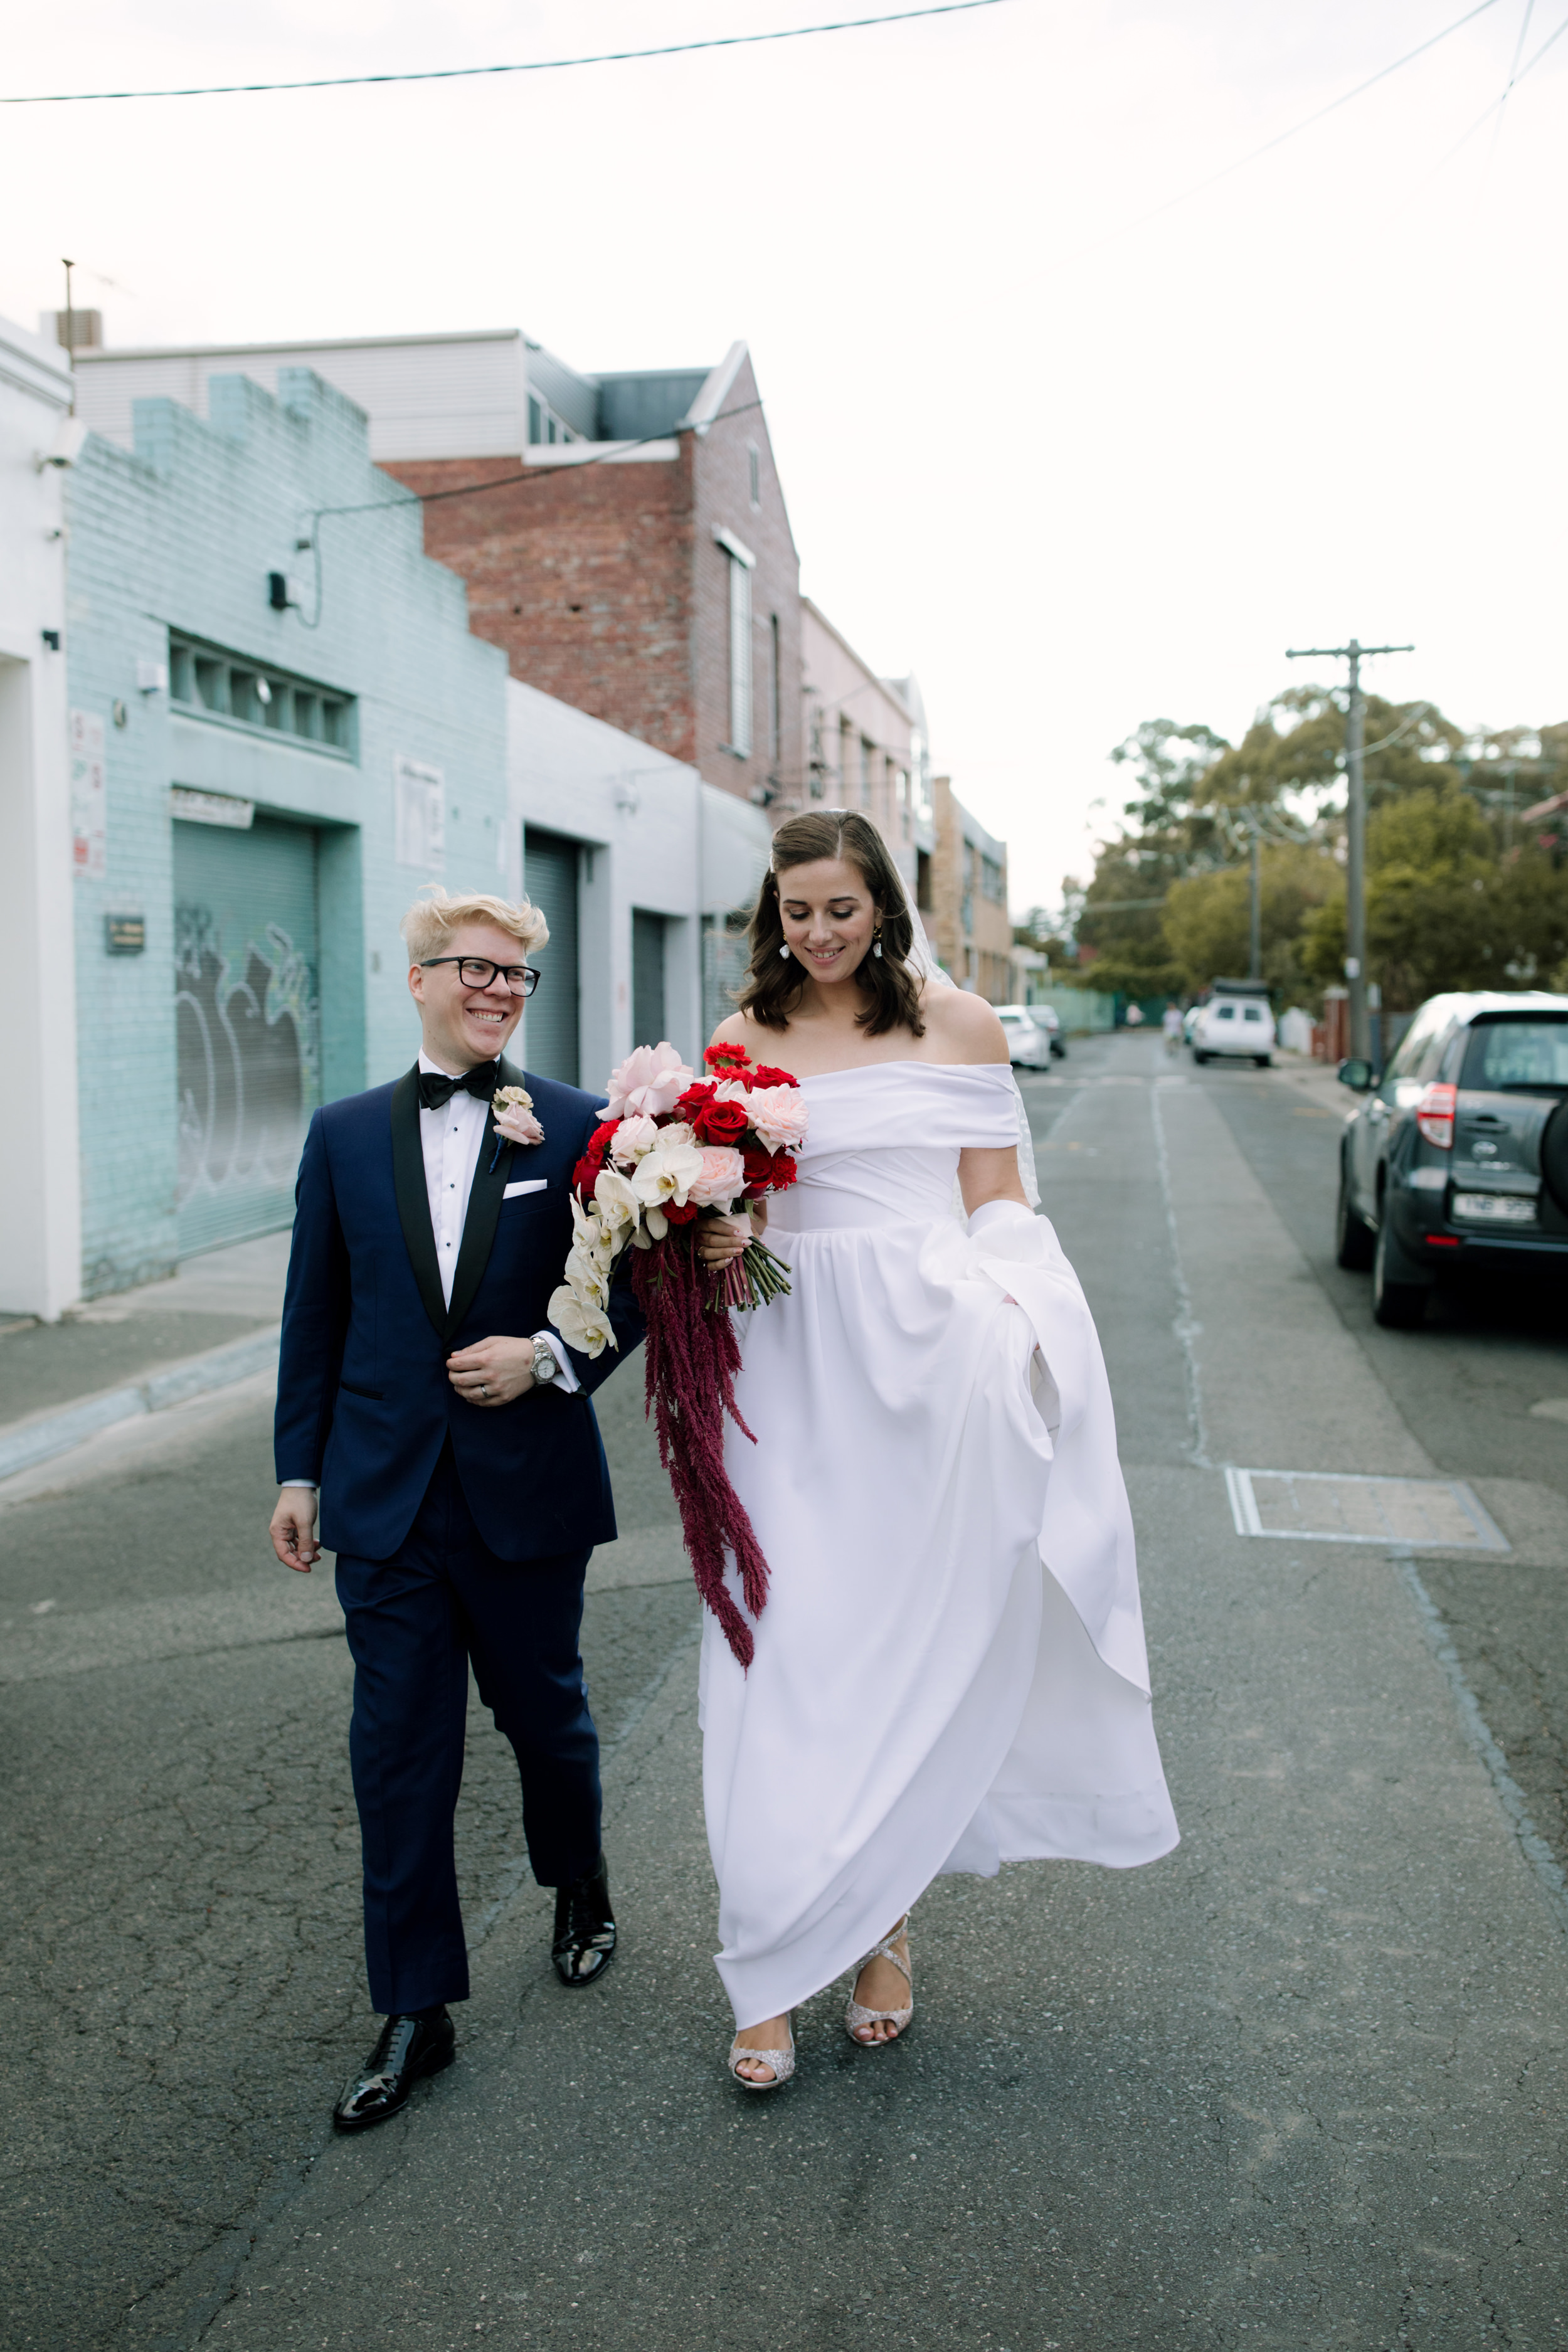 I-Got-You-Babe-Weddings-Tahlia&Mitch-Butler-Lane-Wedding0235.JPG